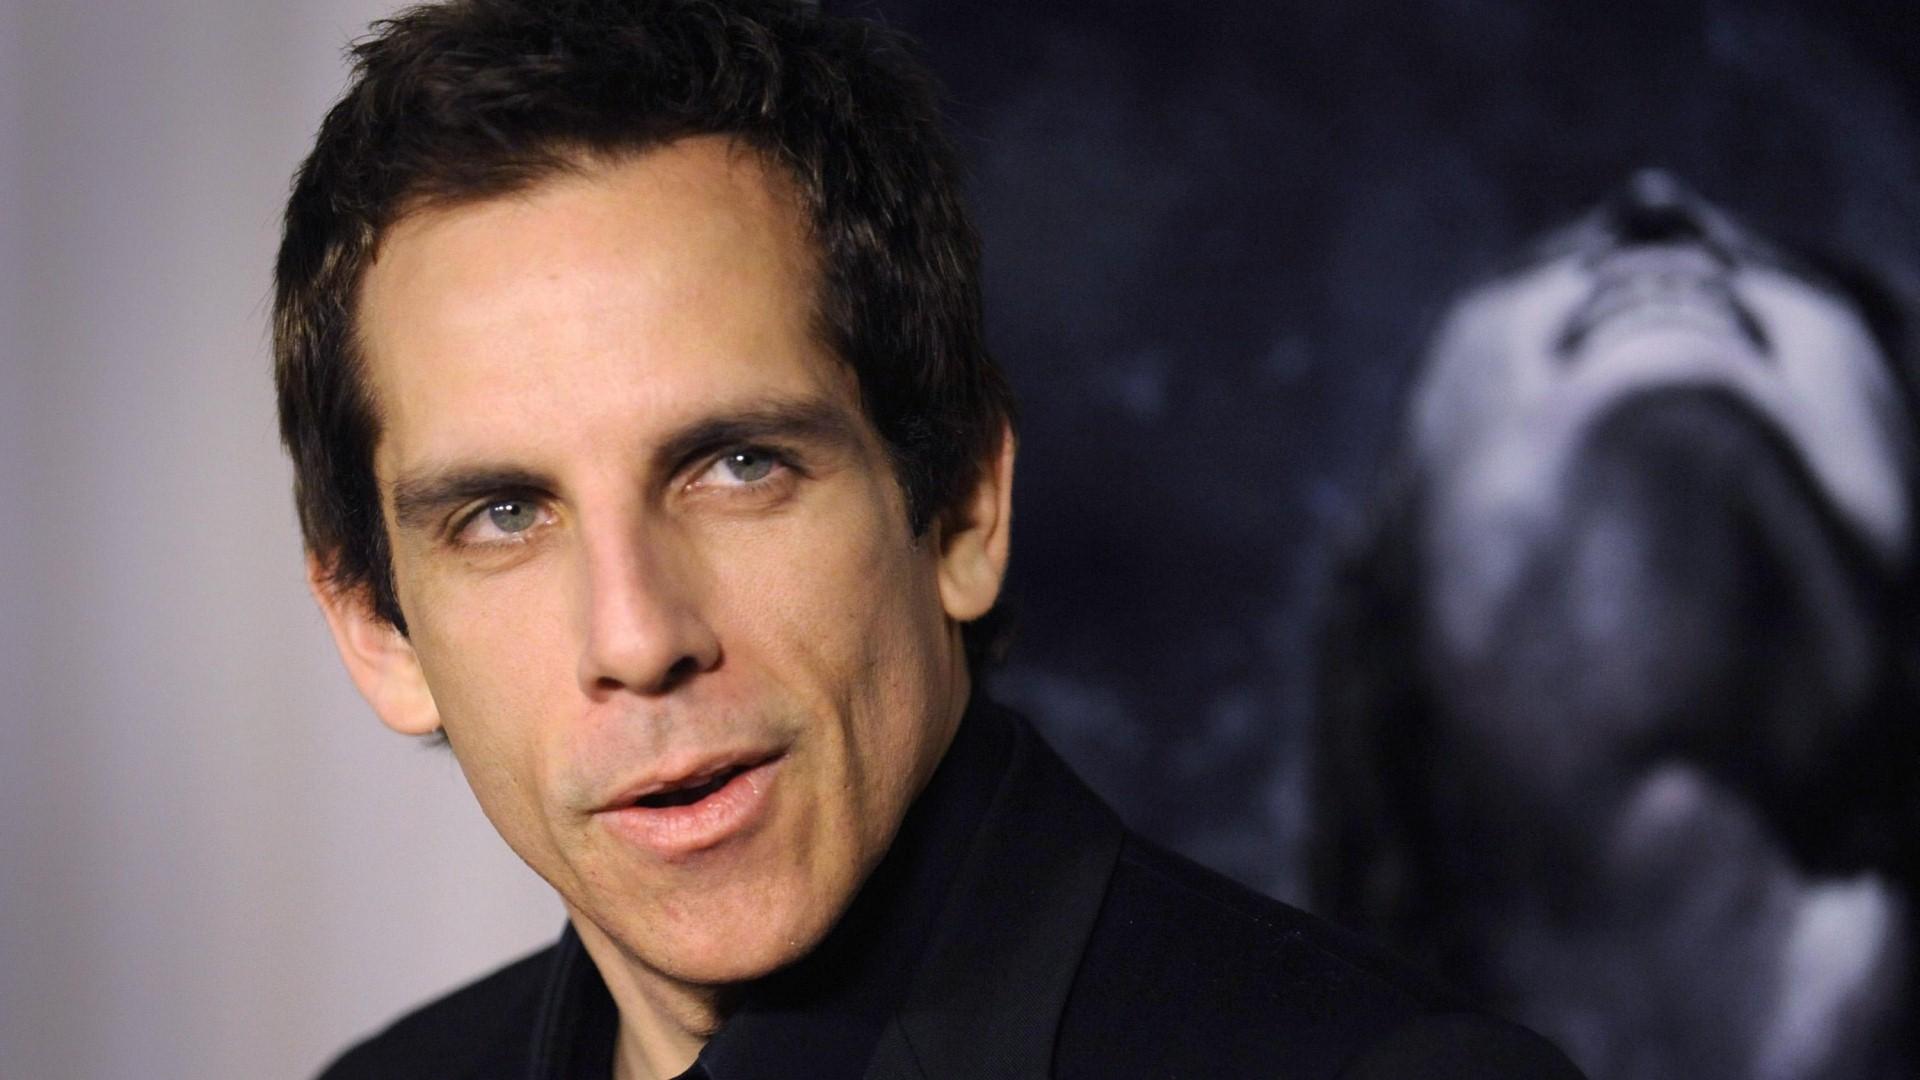 Ben Stiller Wallpapers Download HD New Hollywood Actors Images 1920x1080